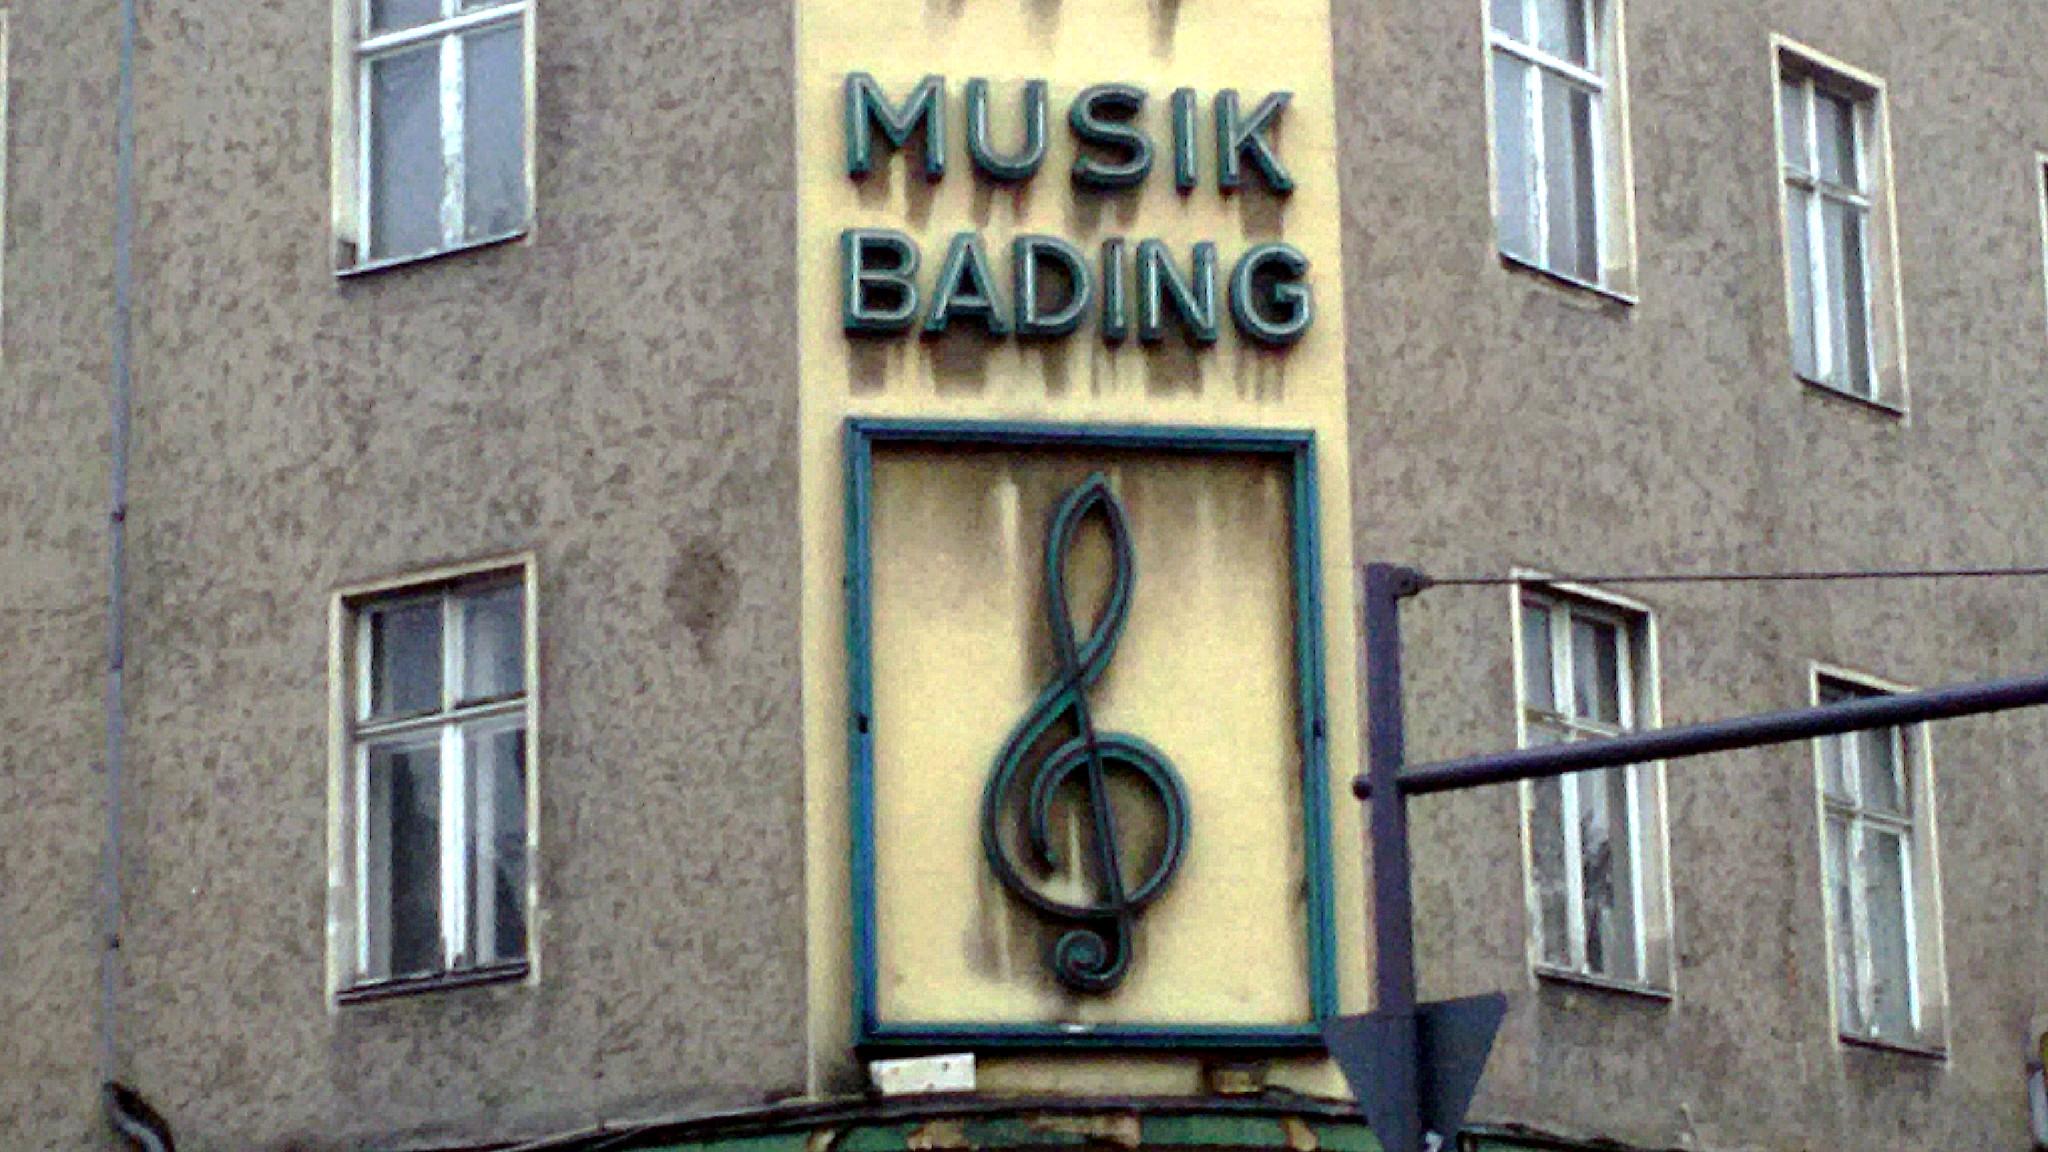 Musik Bading Hausfassade nach dem Brand